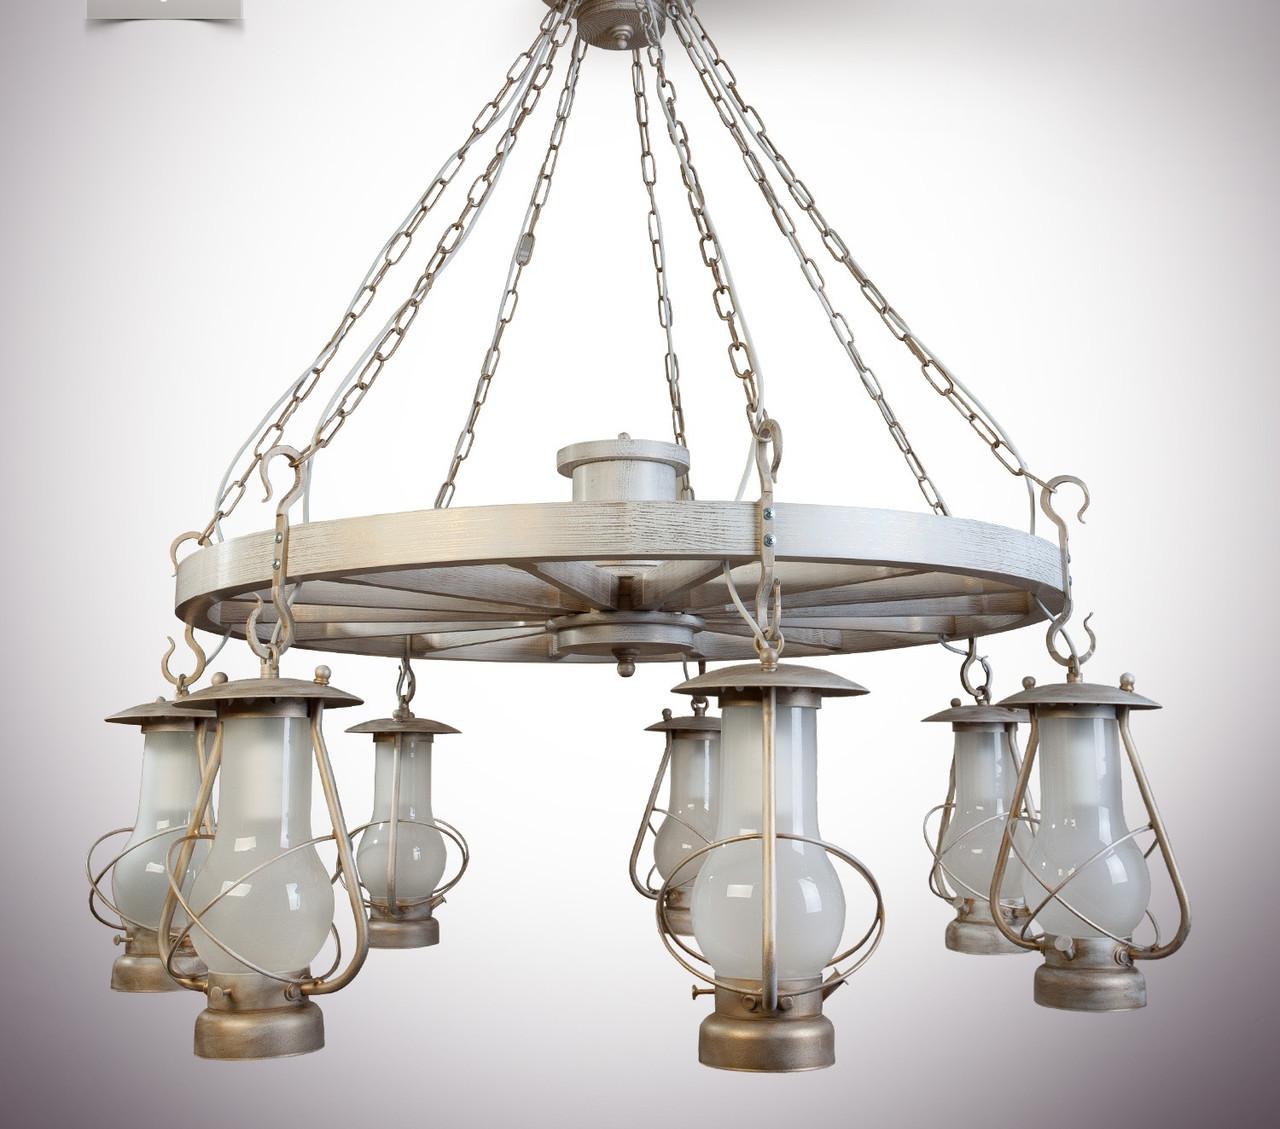 Люстра 7-ми лампова, люстра гасниця, люстра колесо 9407-1